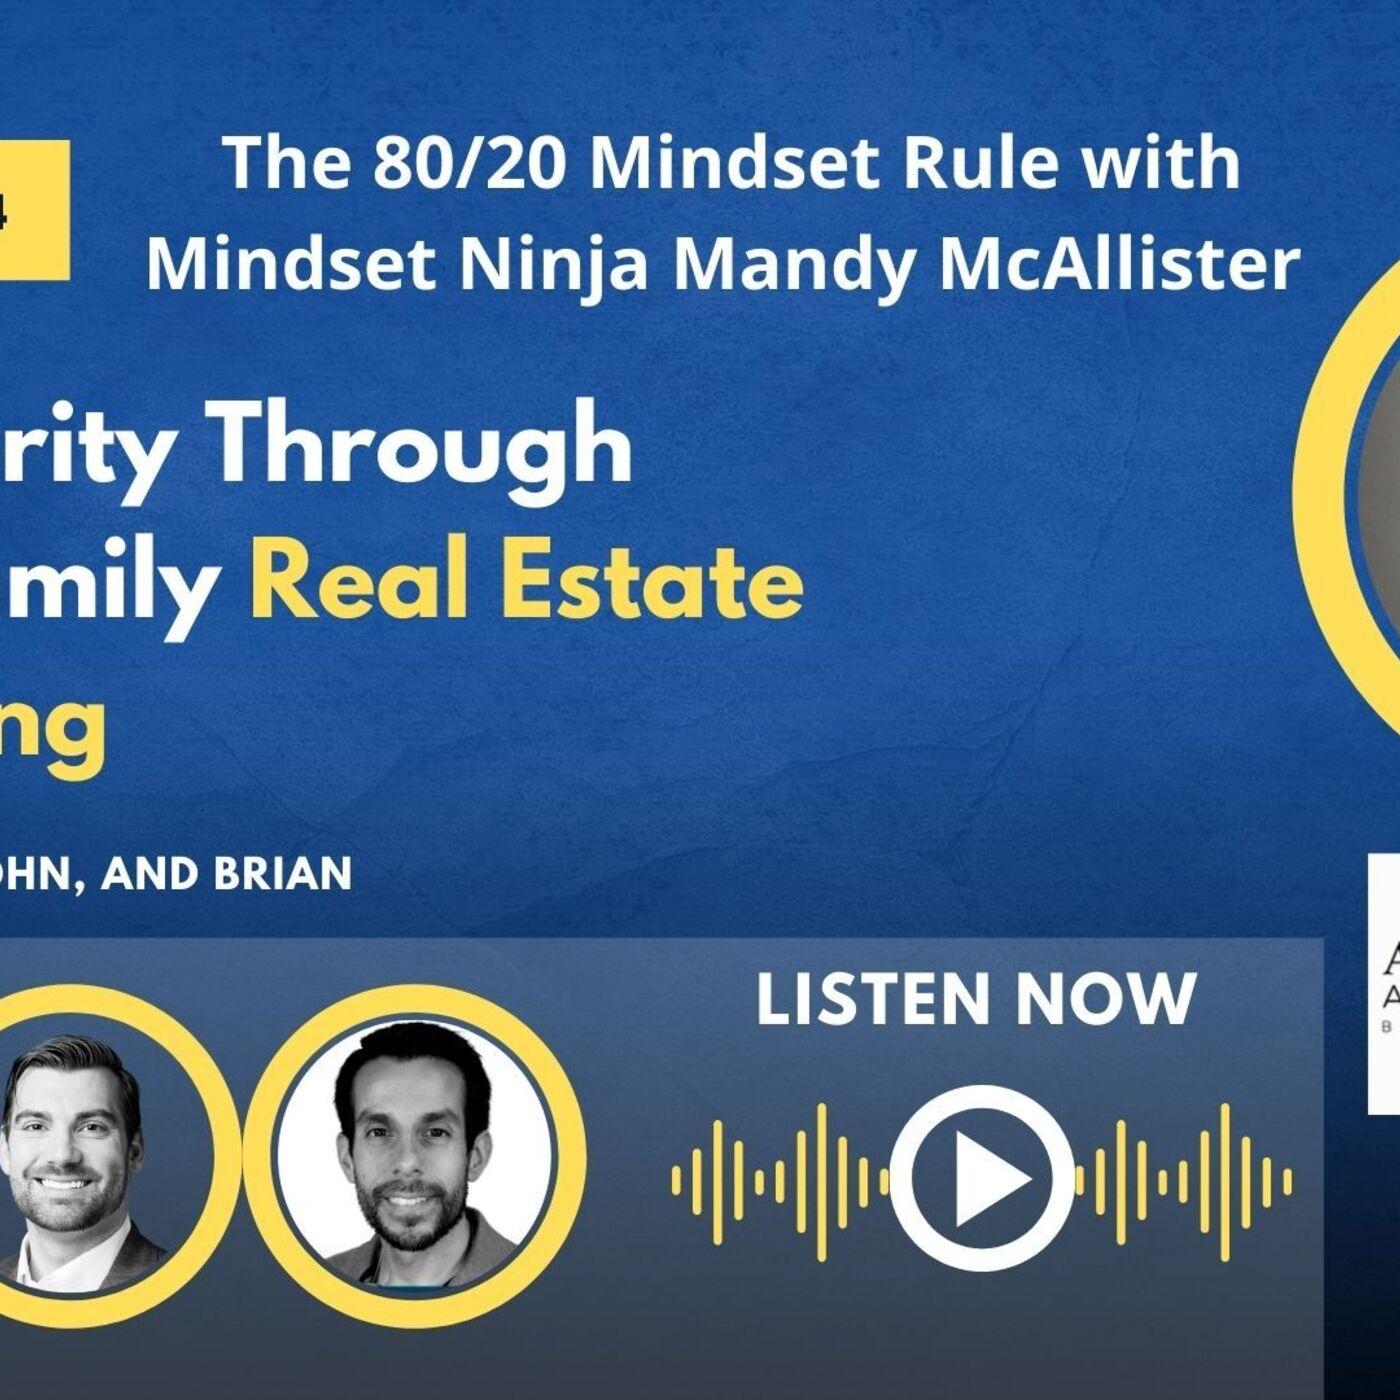 The 80-20 Mindset Rule with Mindset Ninja Mandy McAllister